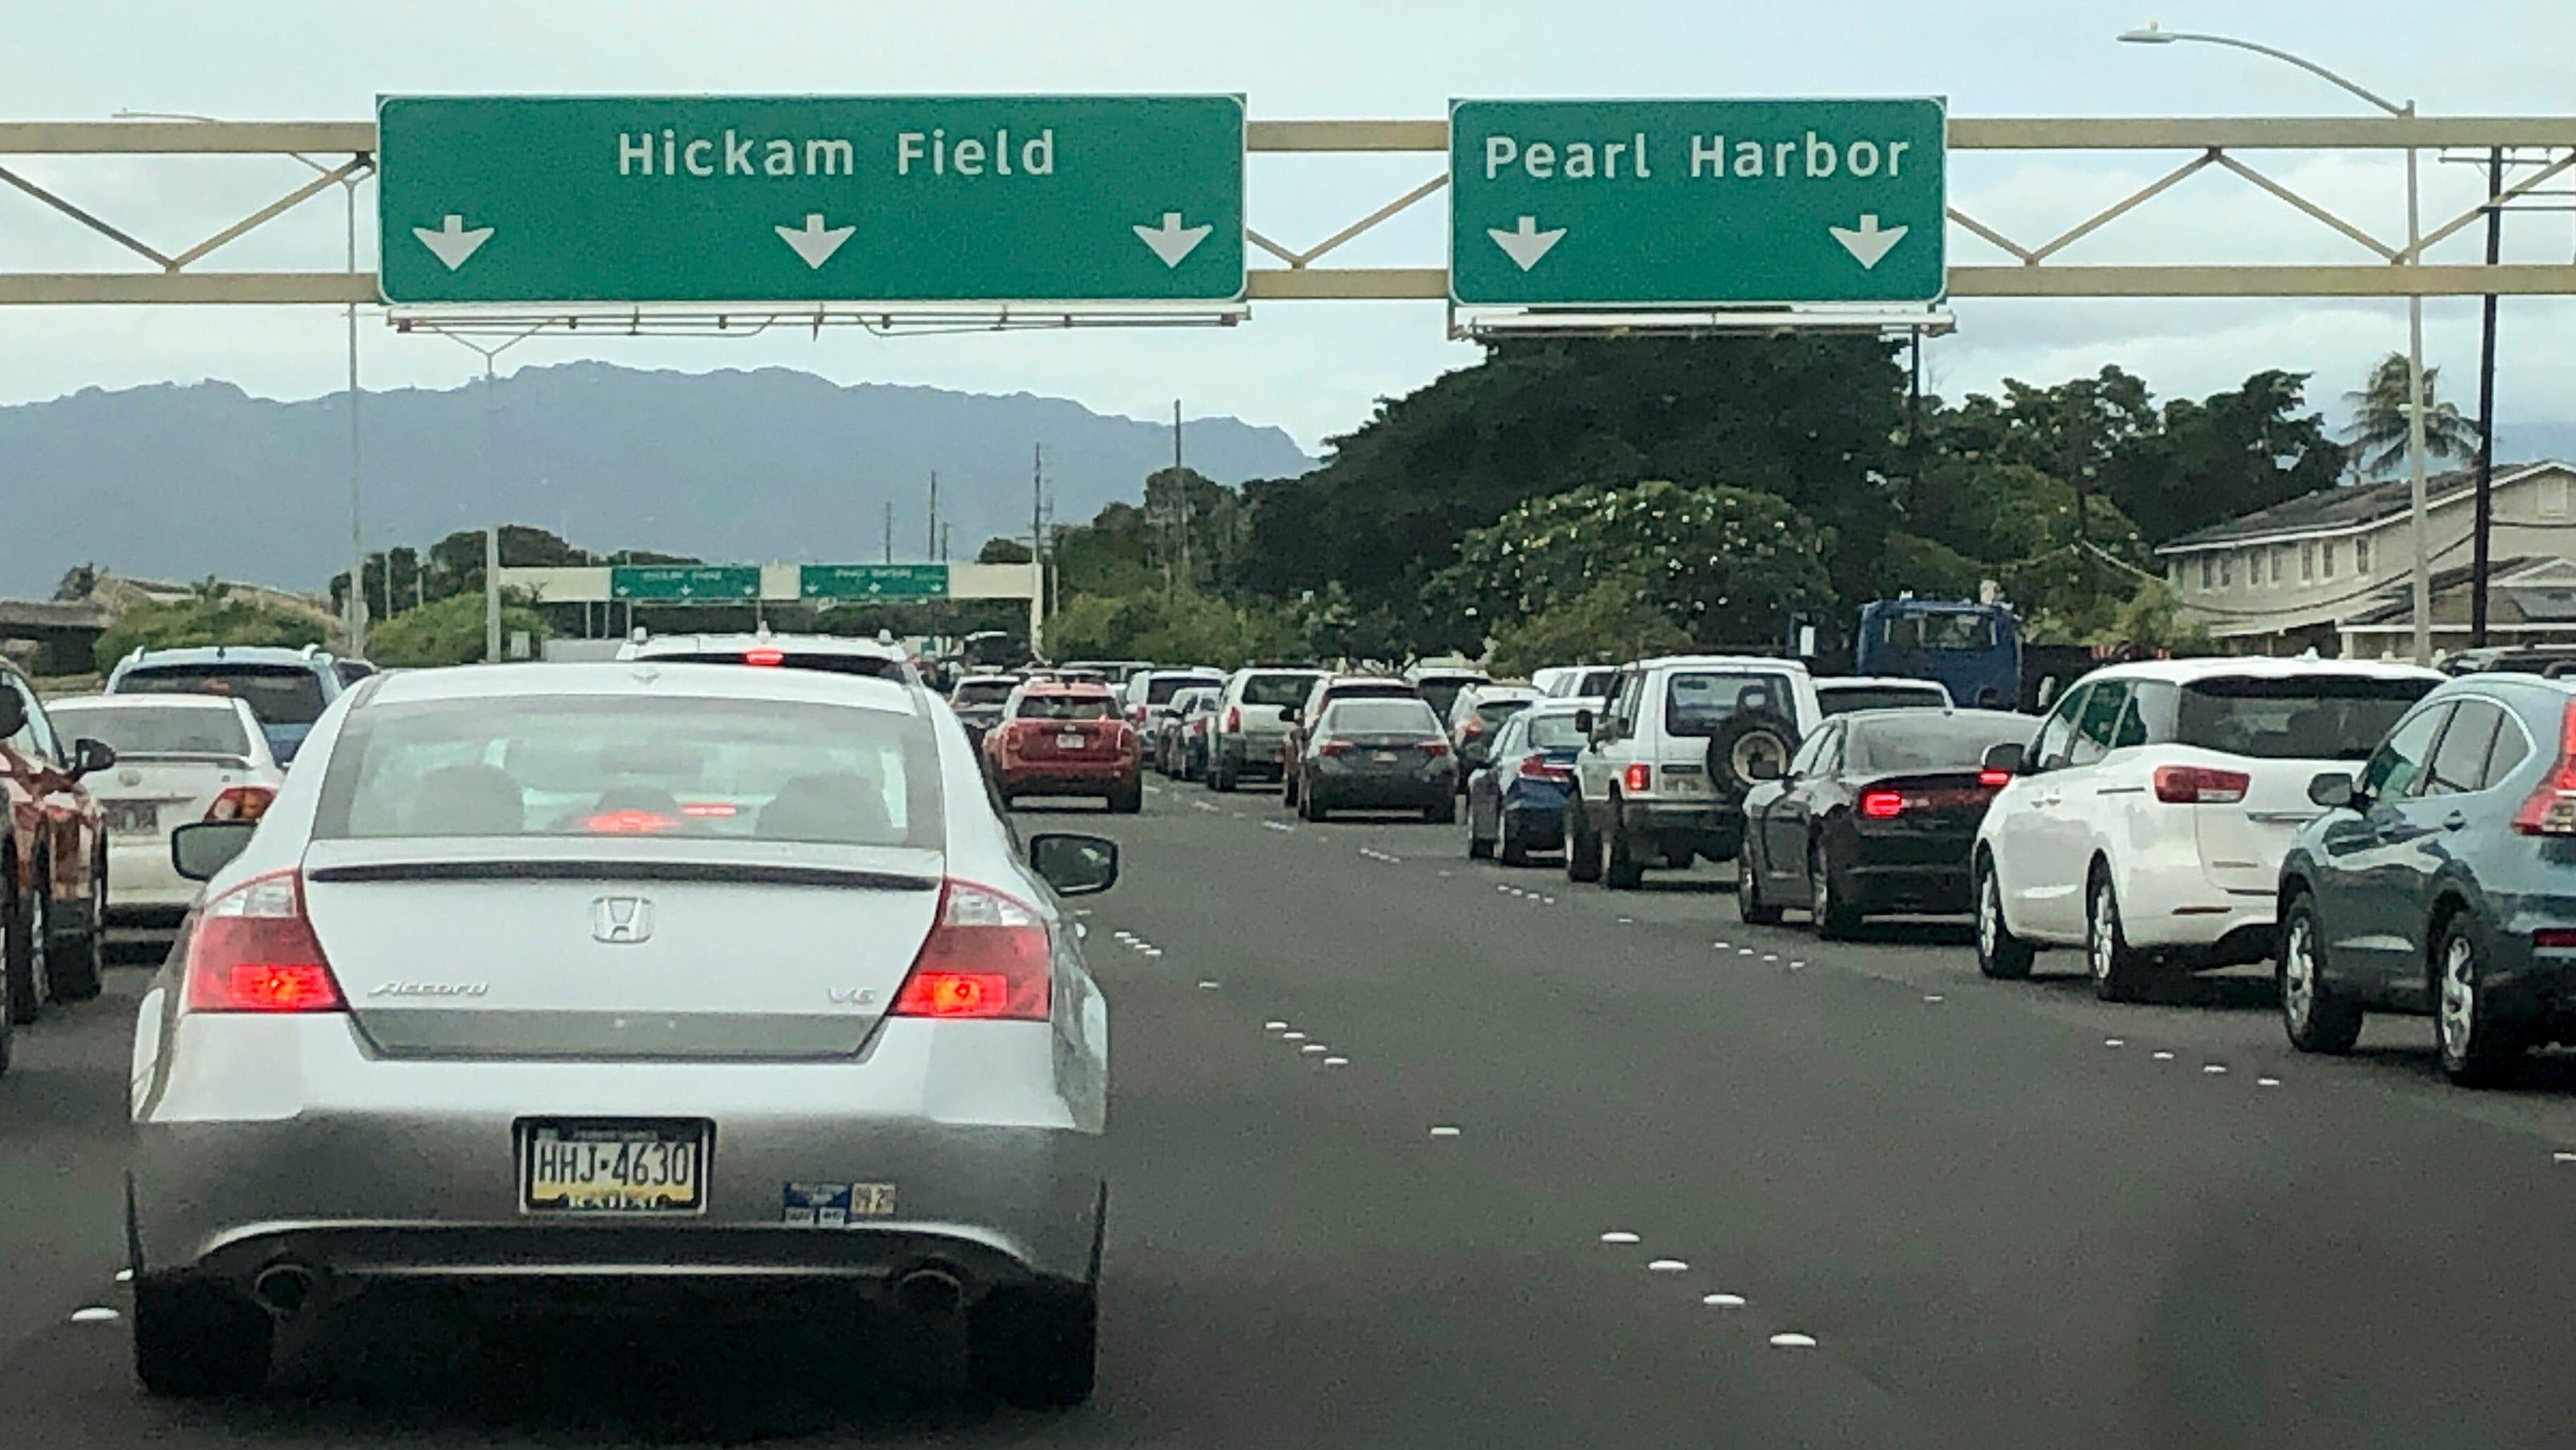 Pearl Harbor Naval Shipyard shooting: 1 dead after sailor shoots 3 ...